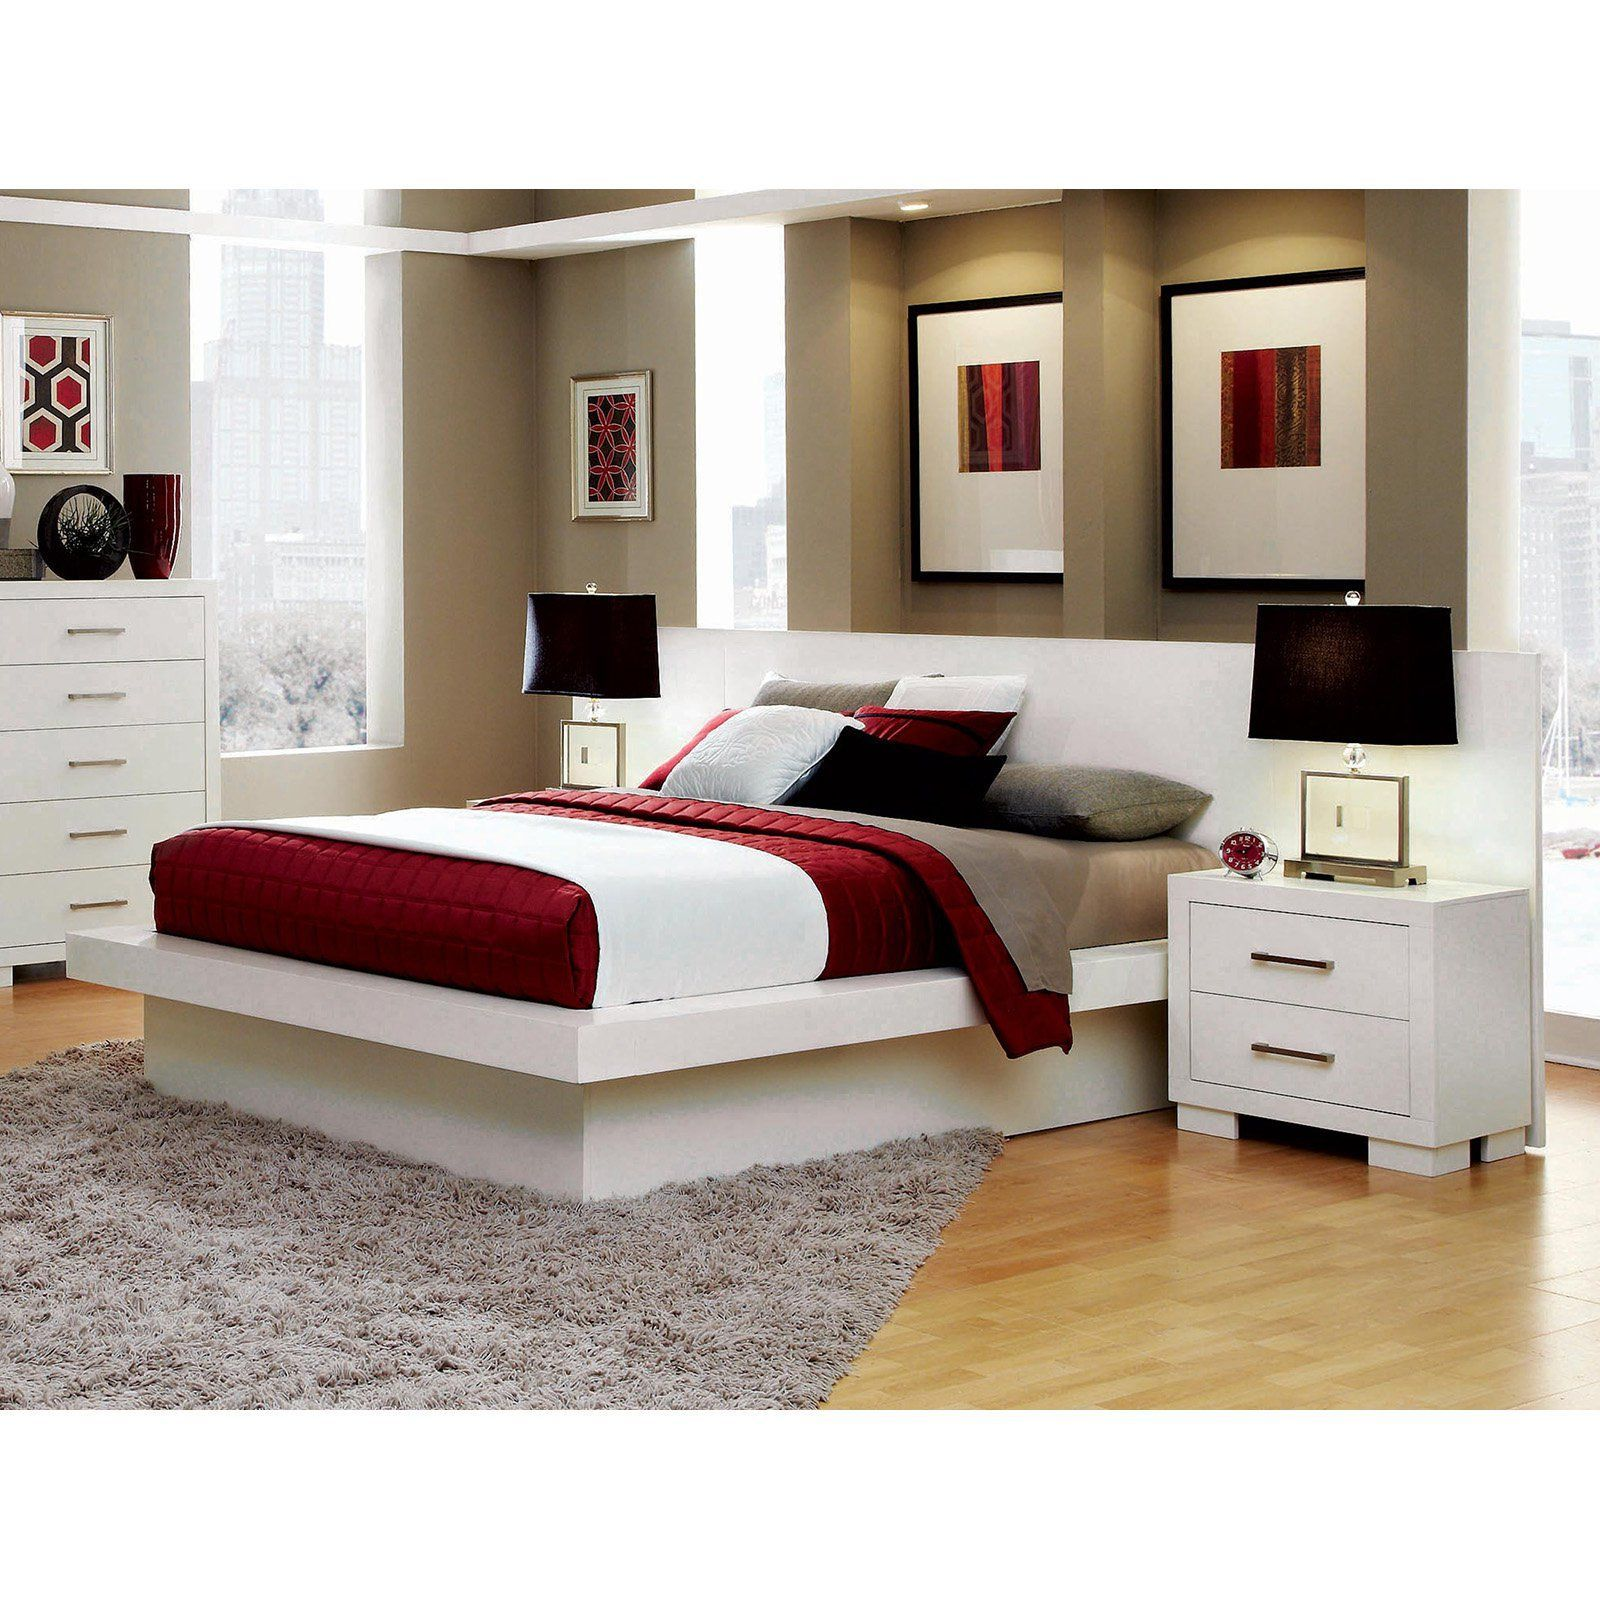 Coaster Furniture Jessica Platform Bed and Nightstand